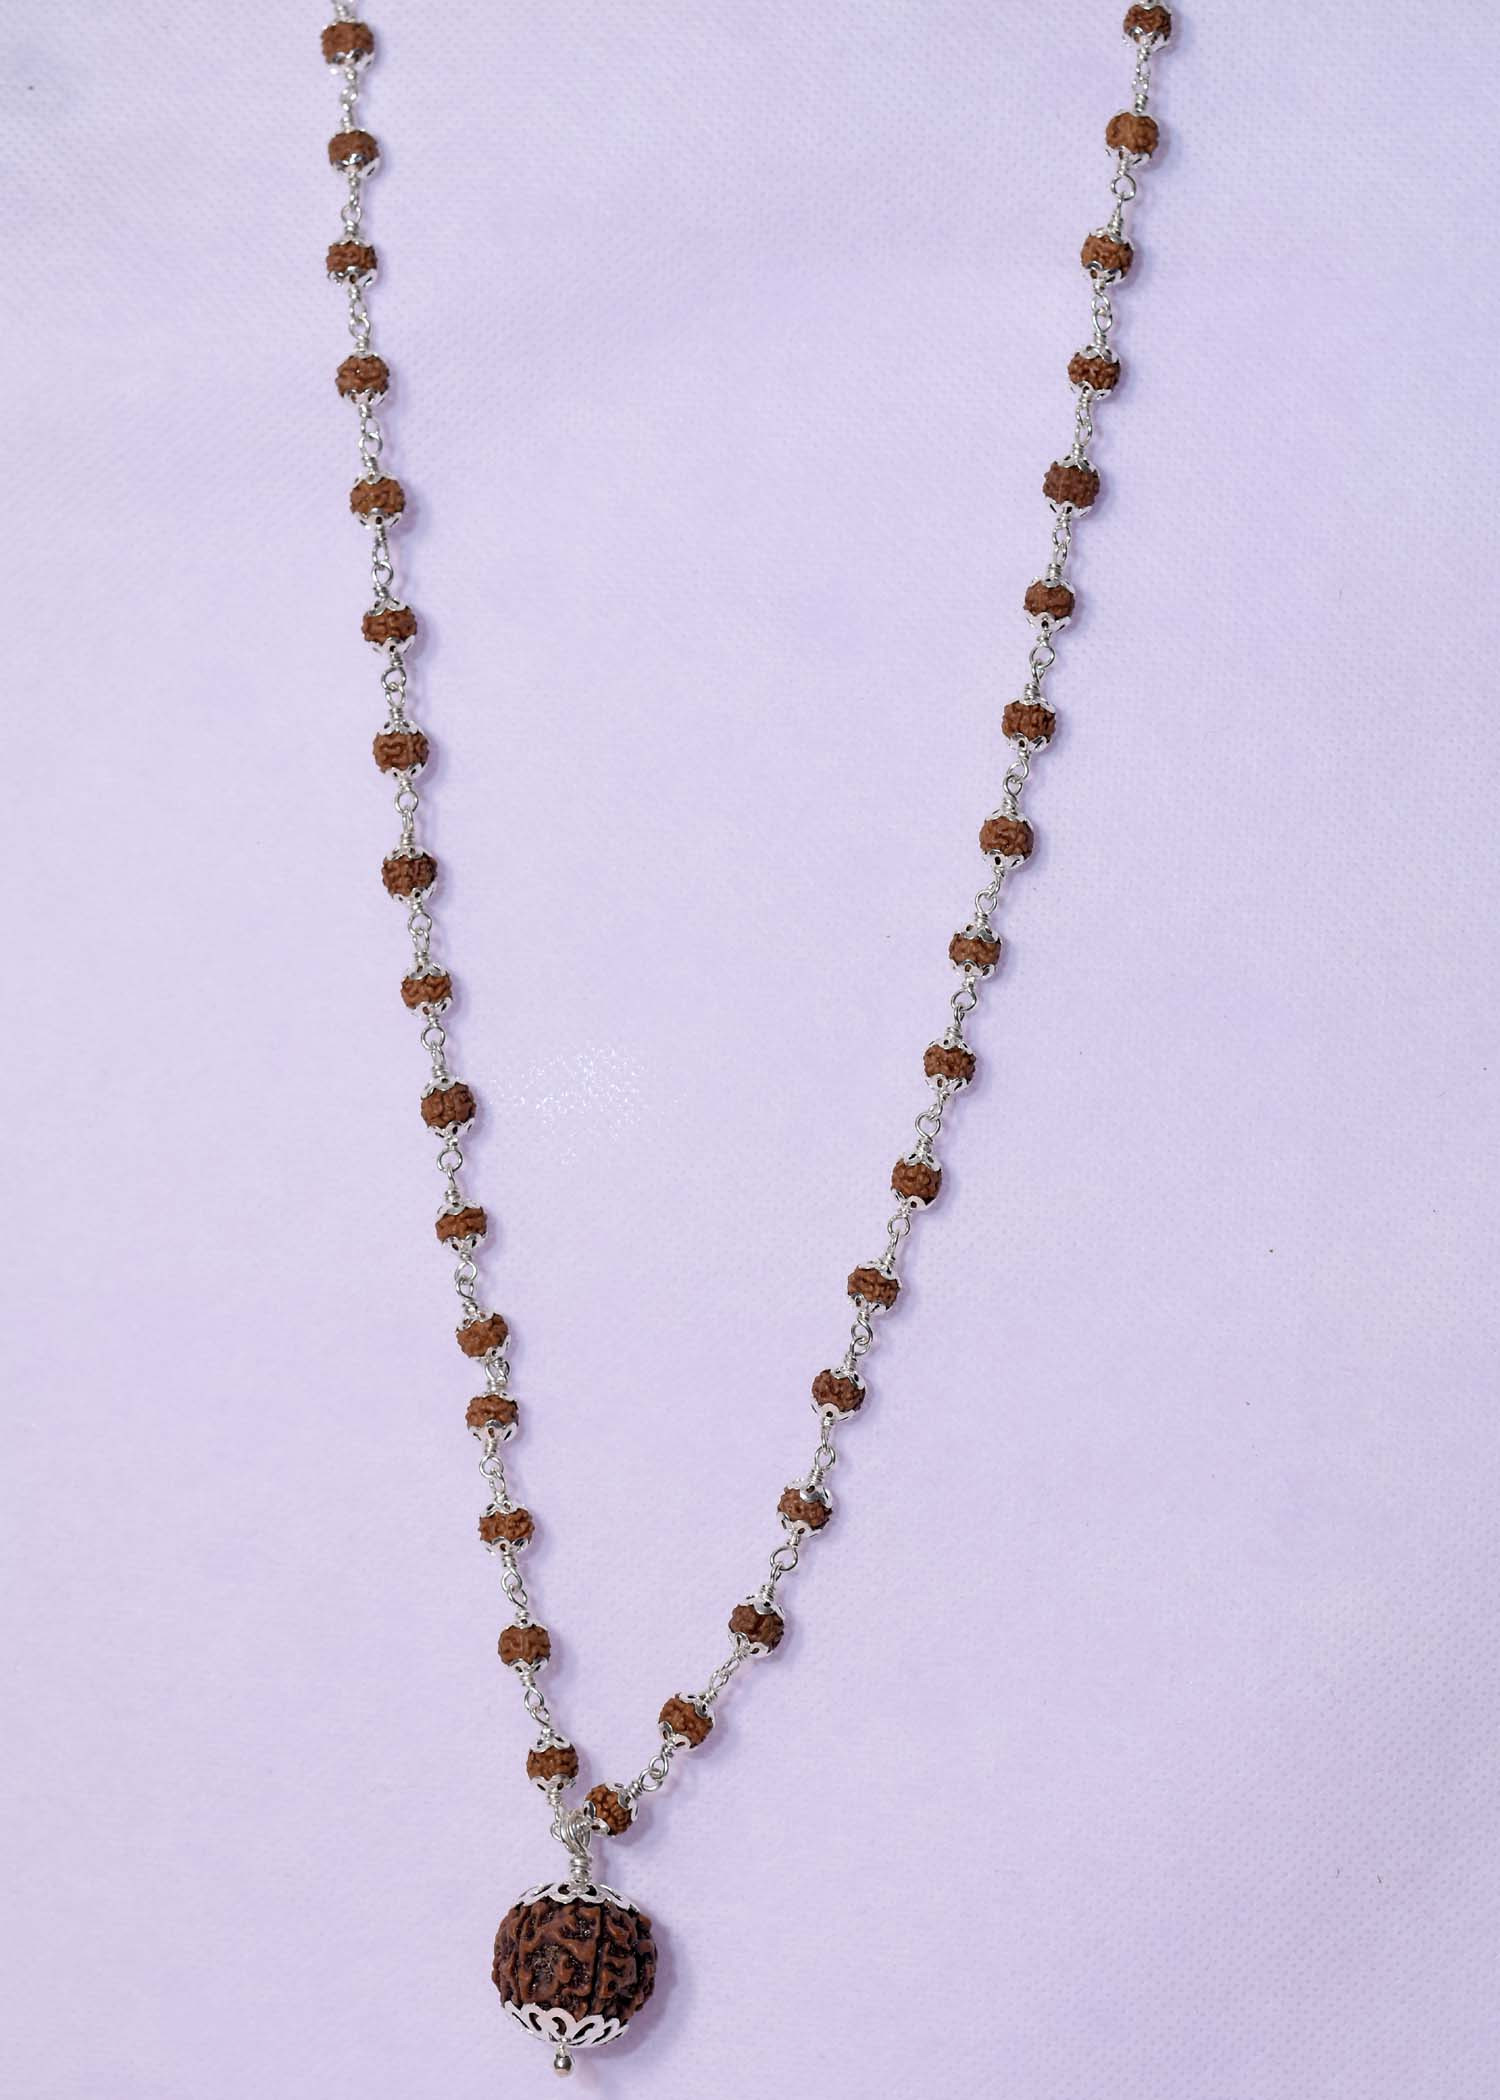 Silver Rudraksh Mala With 7 Mukhi Pendent